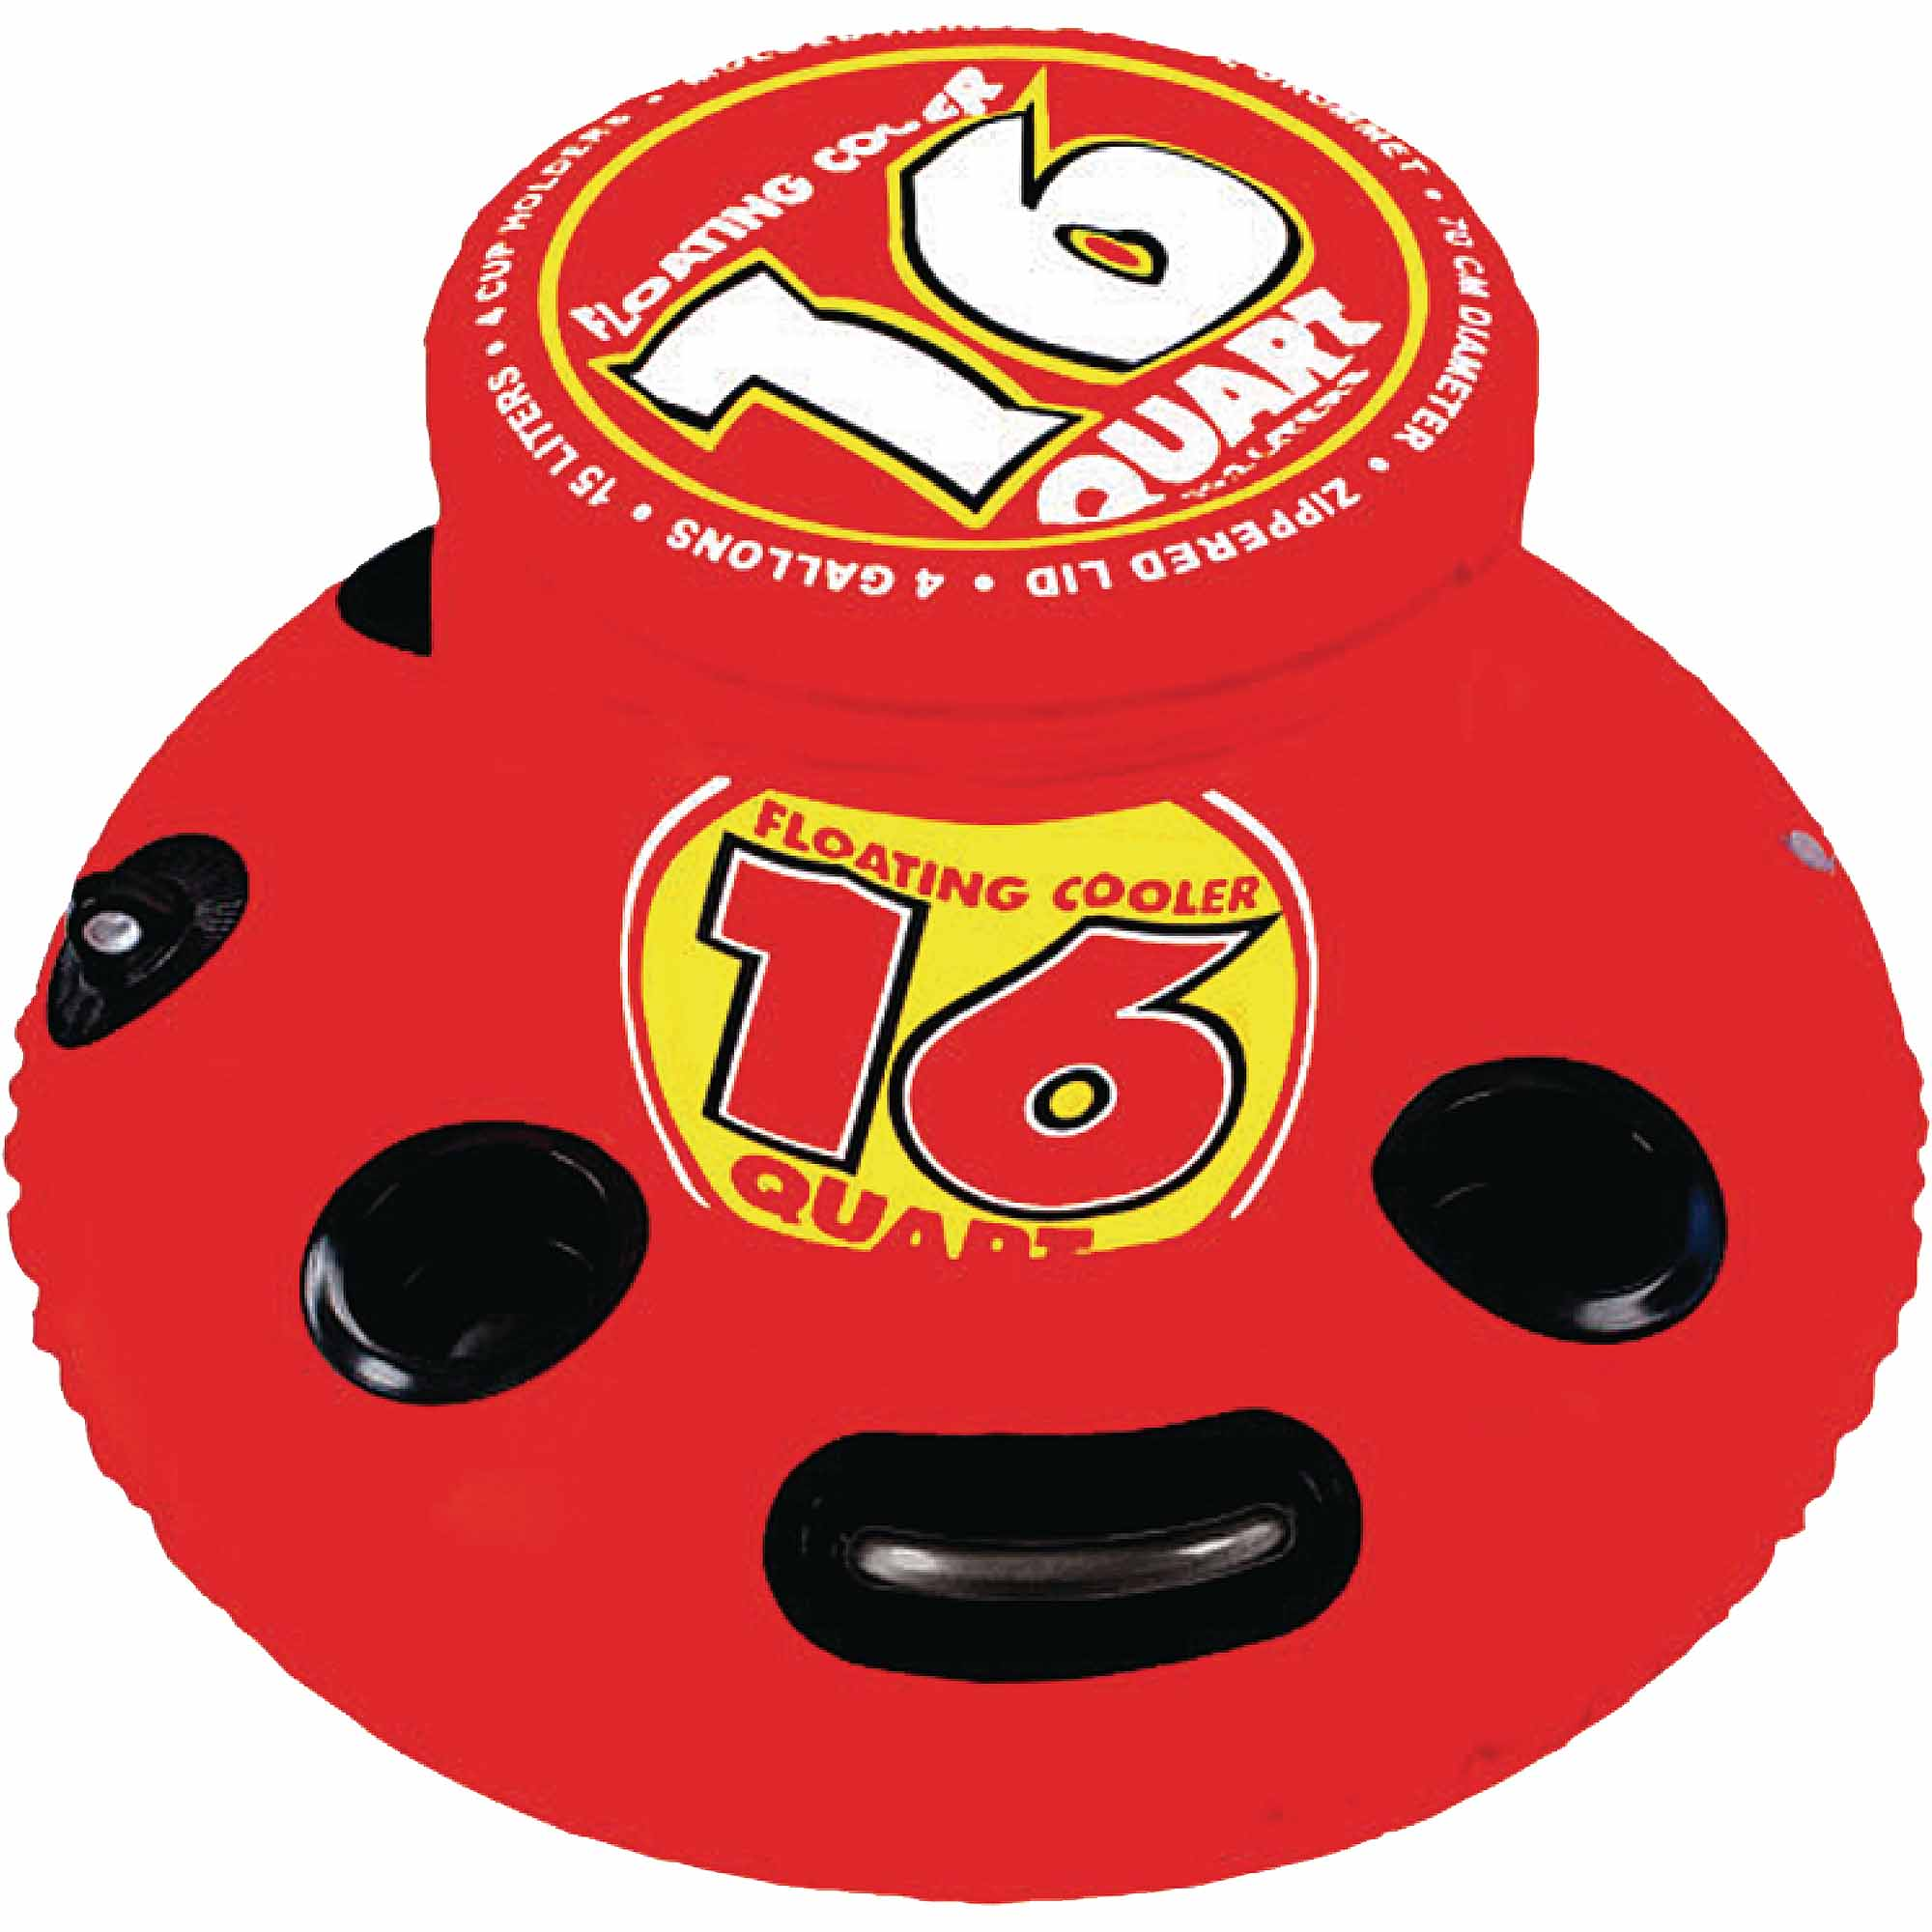 Sportsstuff 16 Quart Inflatable Floating Cooler